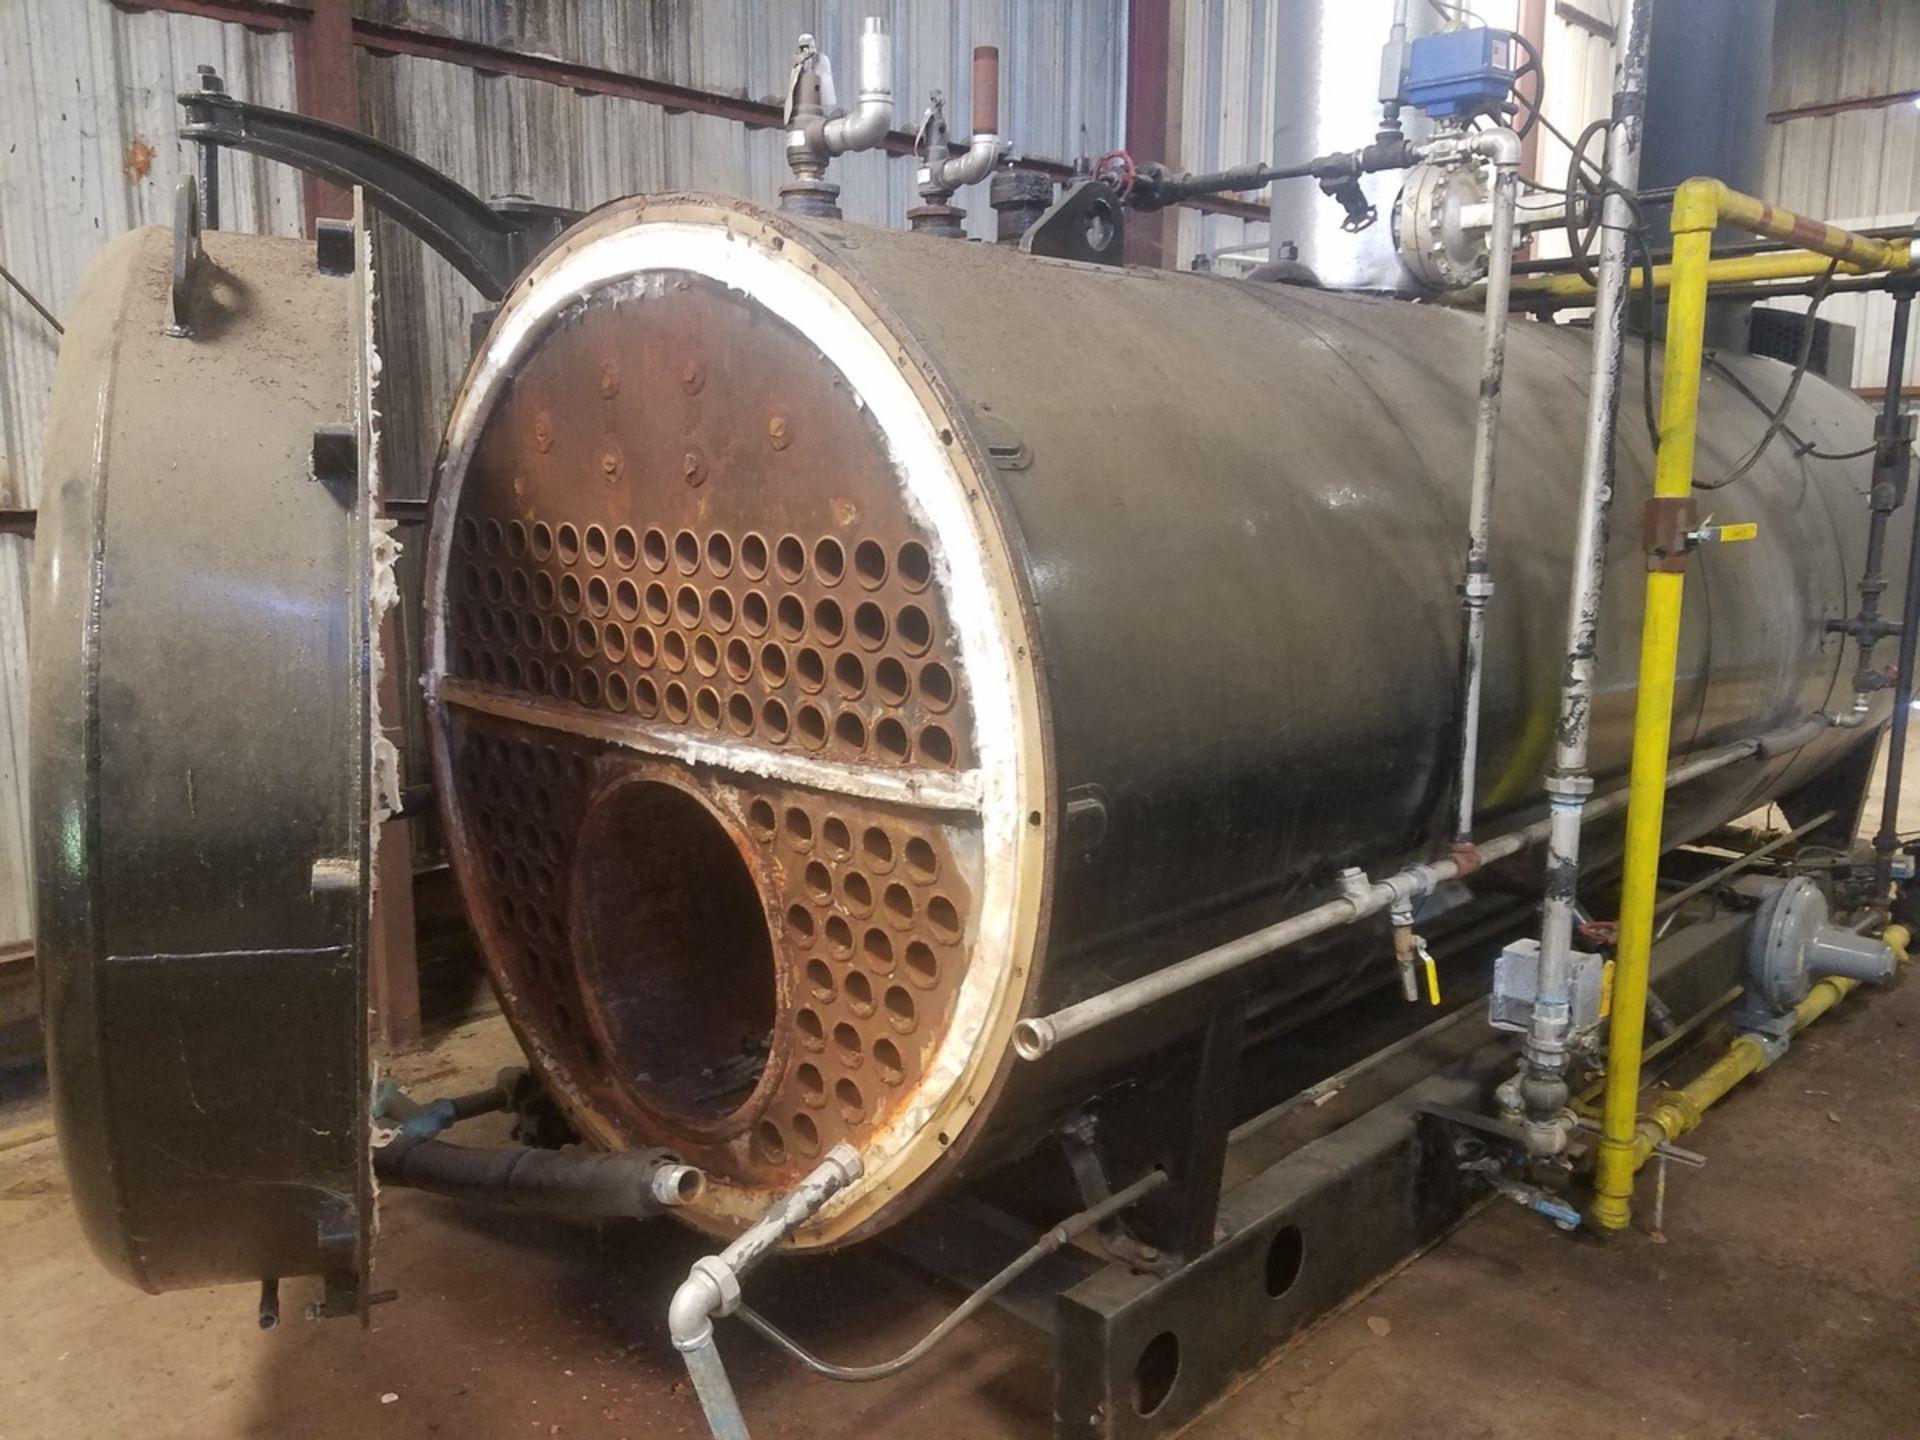 2009 (Rebuilt 2016) 250 HP Cleaver Brooks Boiler, 8.9 mmBTU, M# CB-200-250S-250, | Rig Fee: $5000 - Image 6 of 7